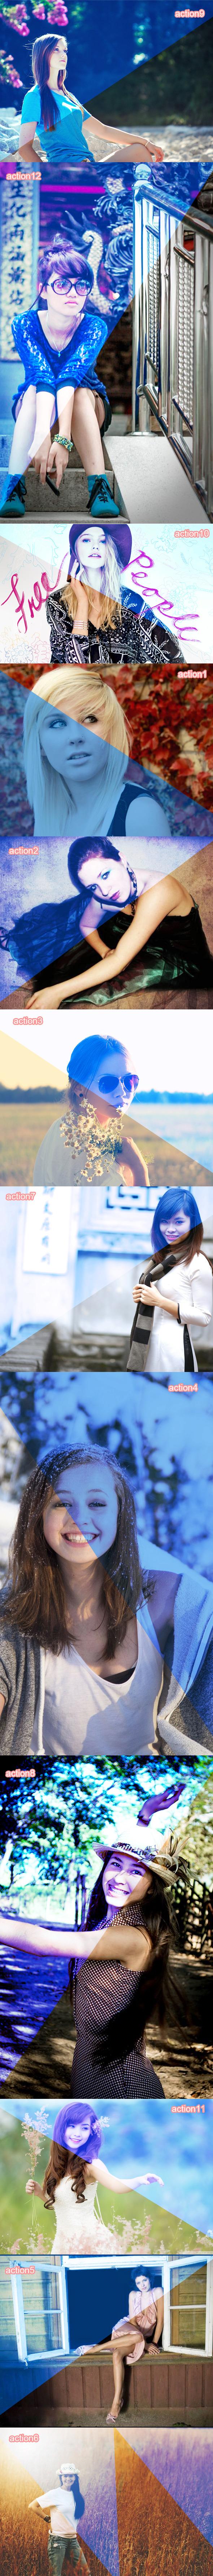 Blue Dream Action - Actions Photoshop